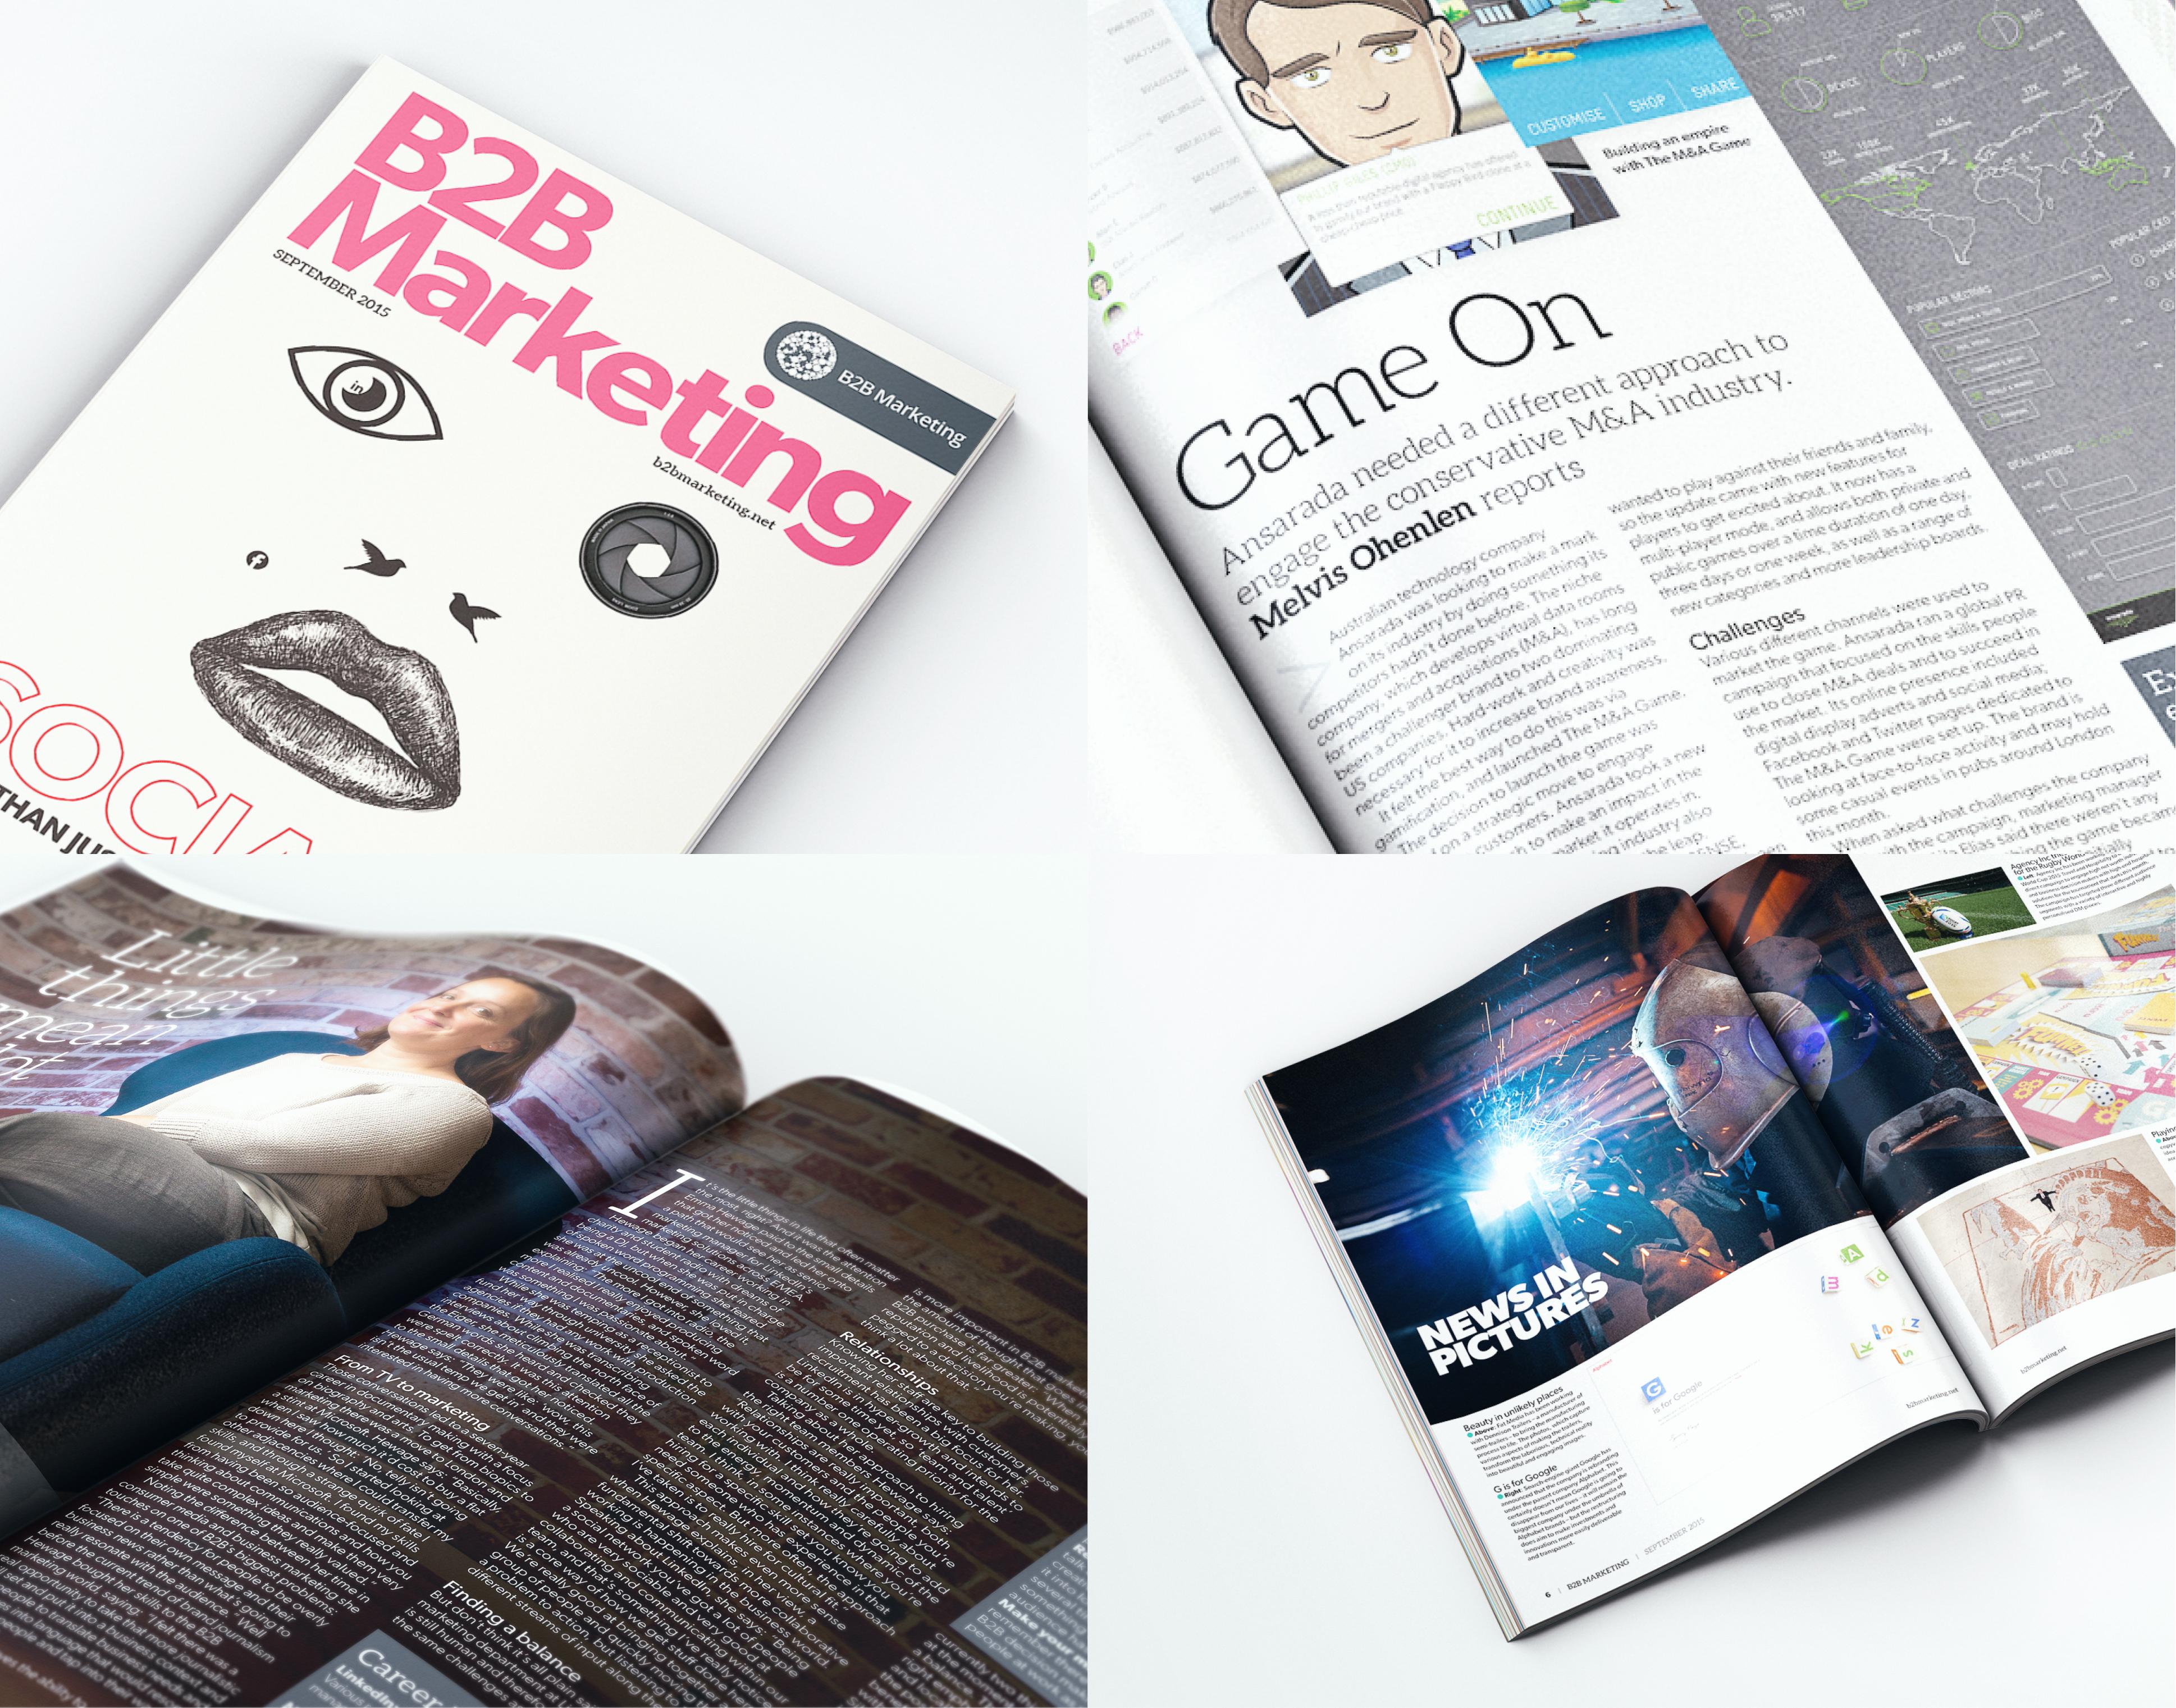 B2B Marketing September issue